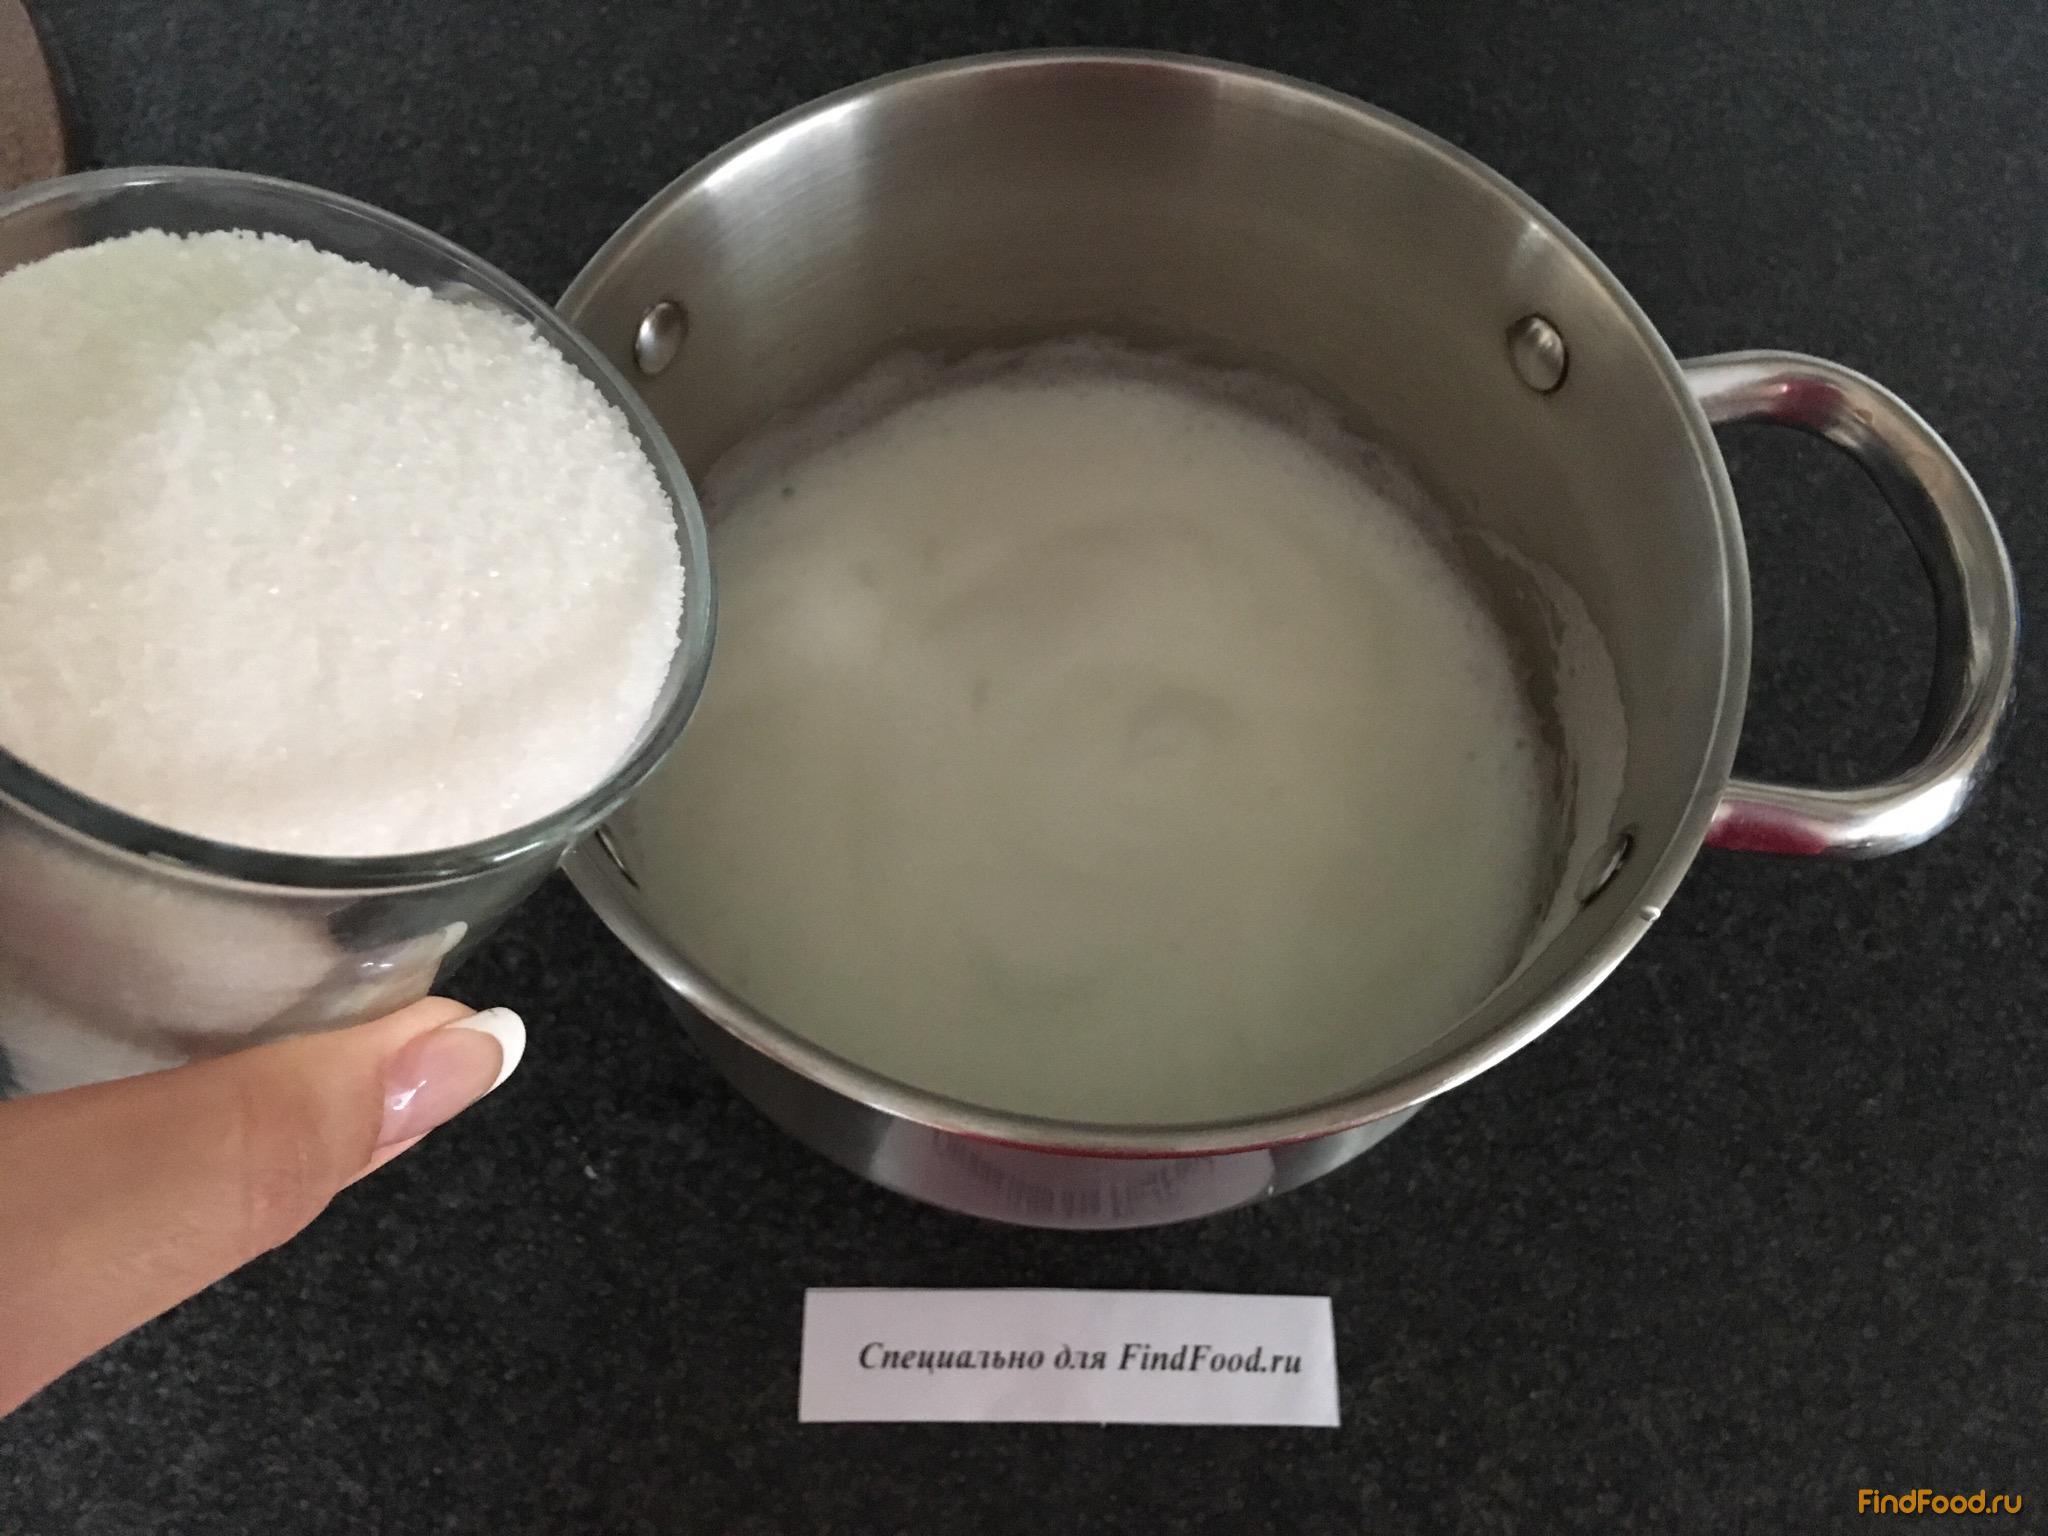 ВАНИЛЬ Кулинарный сайт